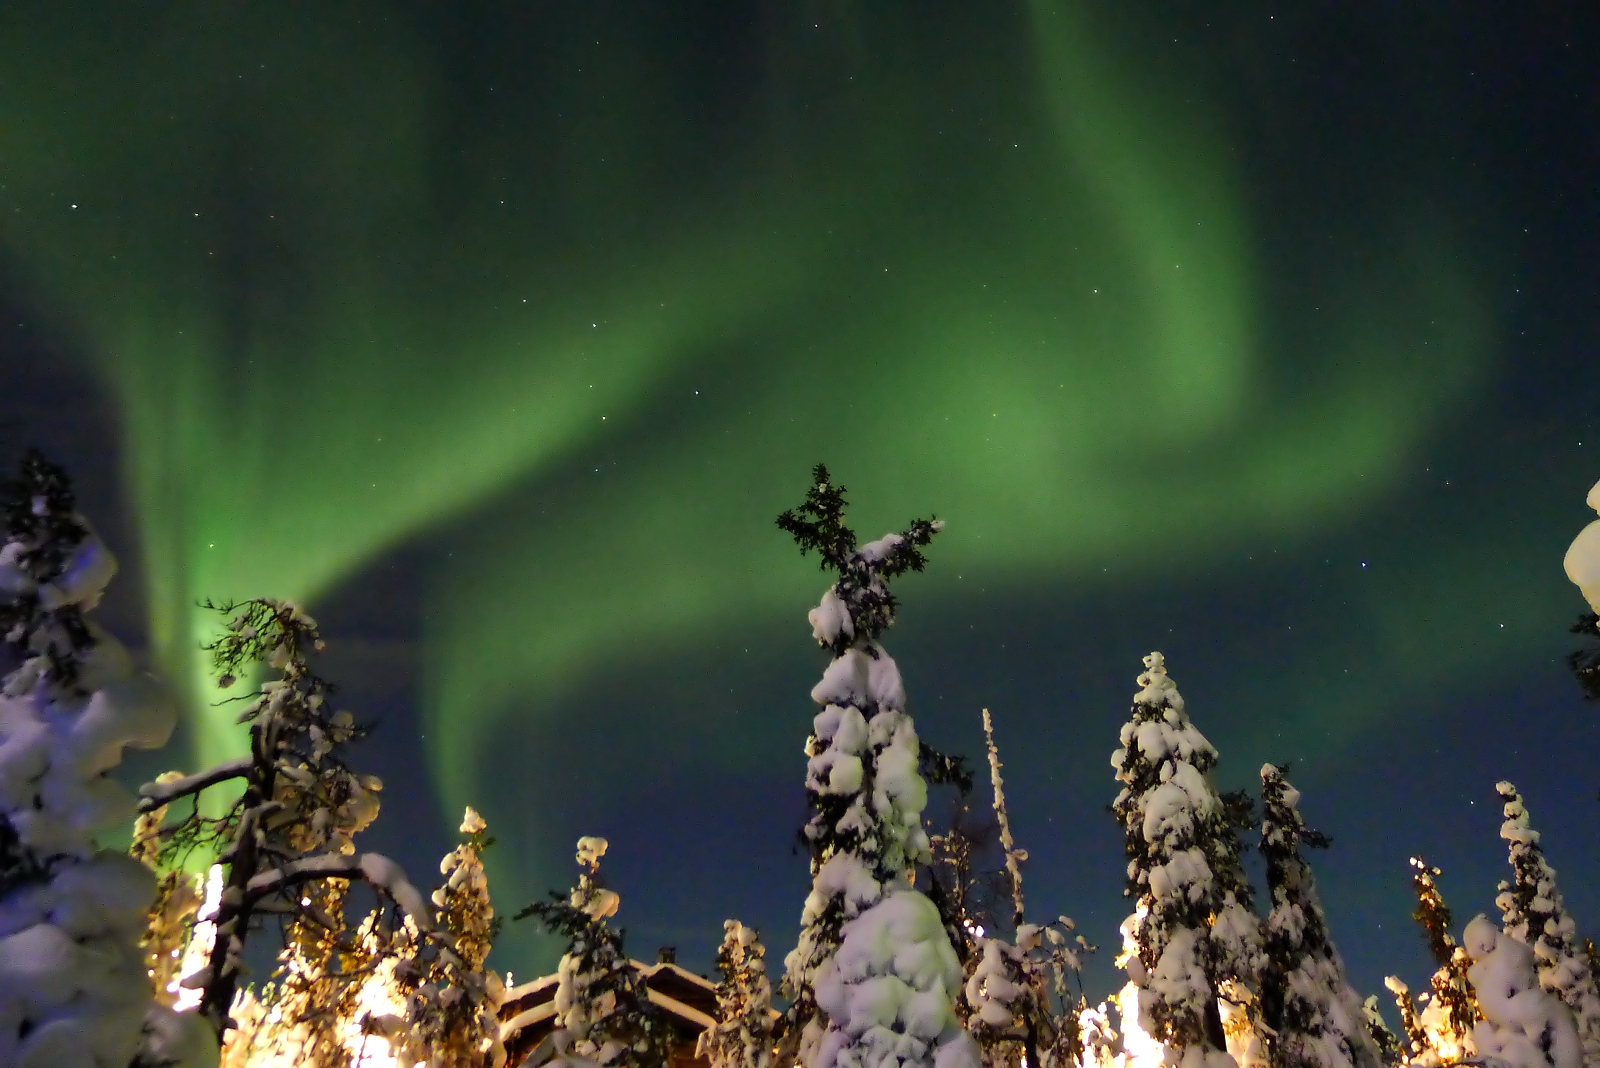 File:Aurora borealis in Ruka, Finland.jpg